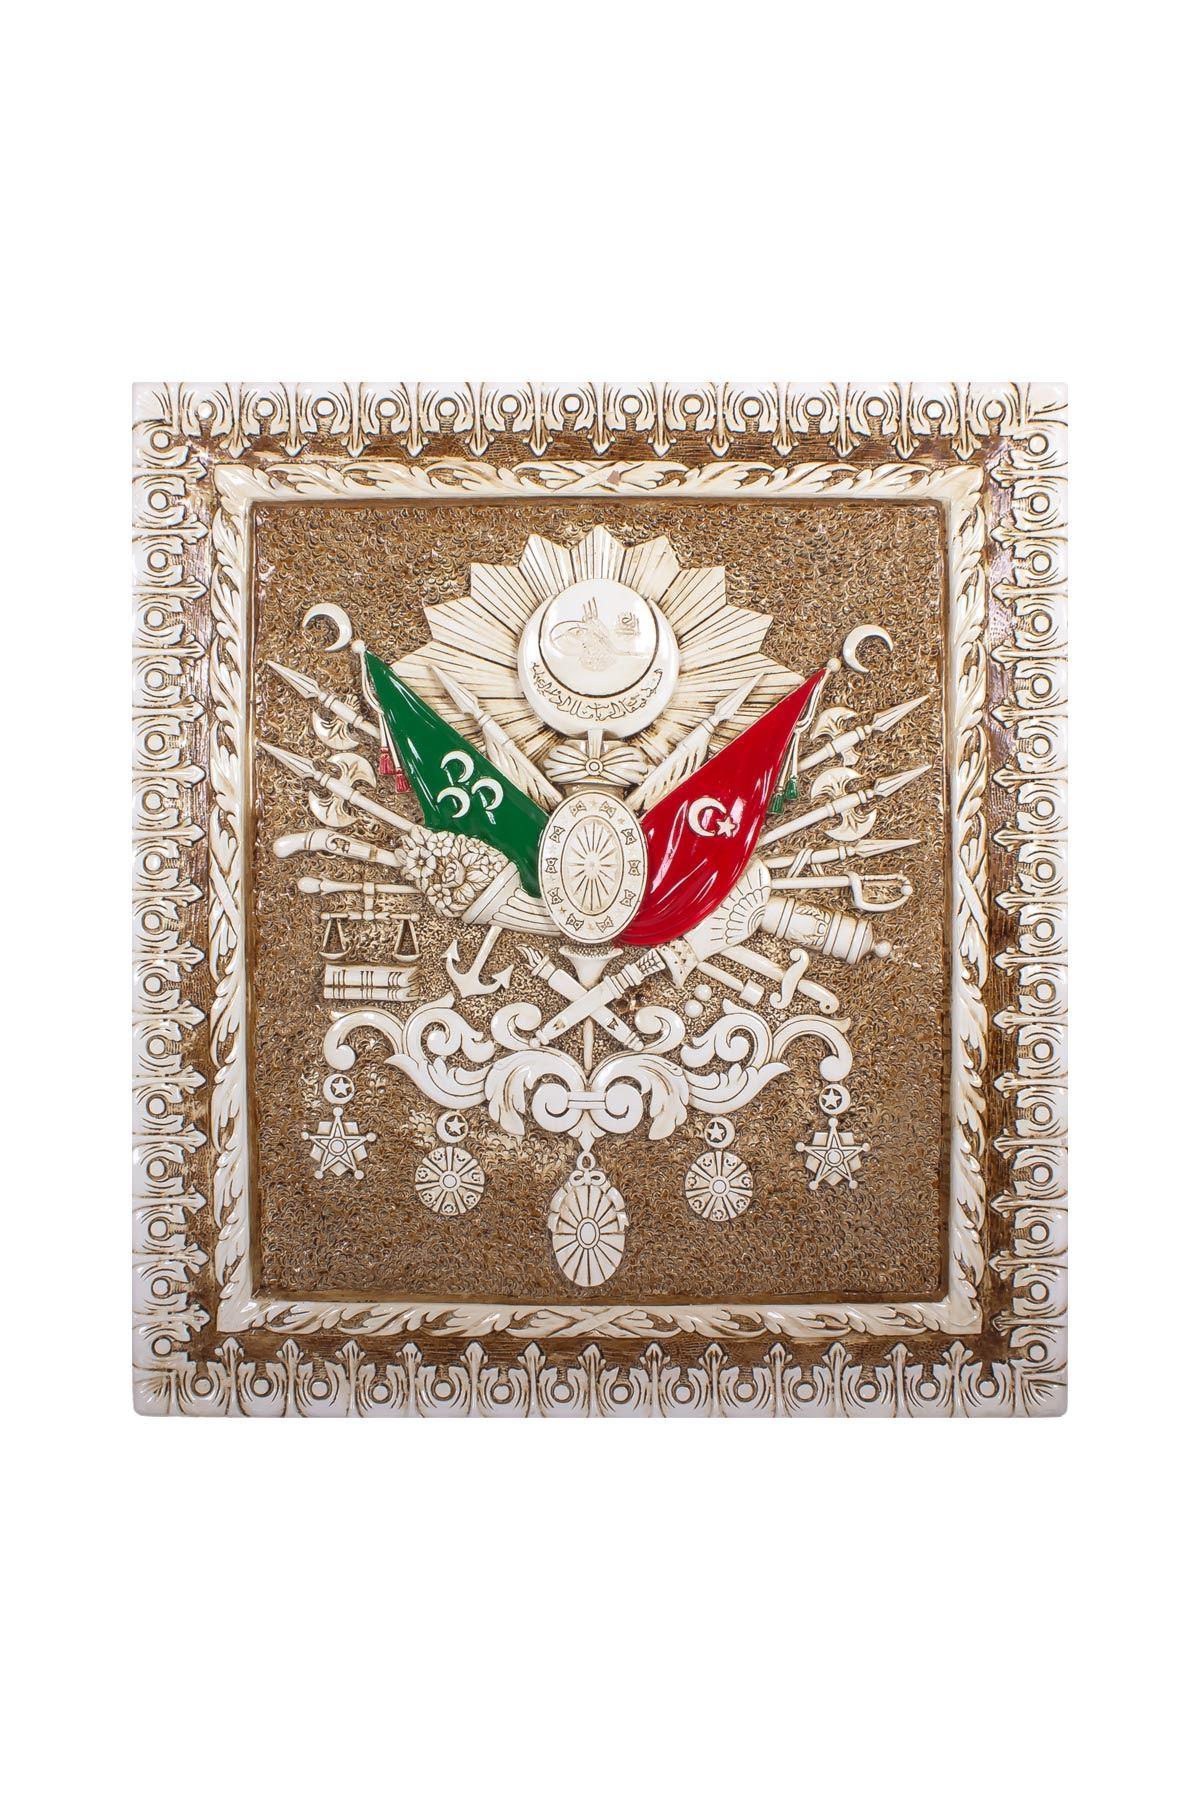 Ottoman State Emblem - White color